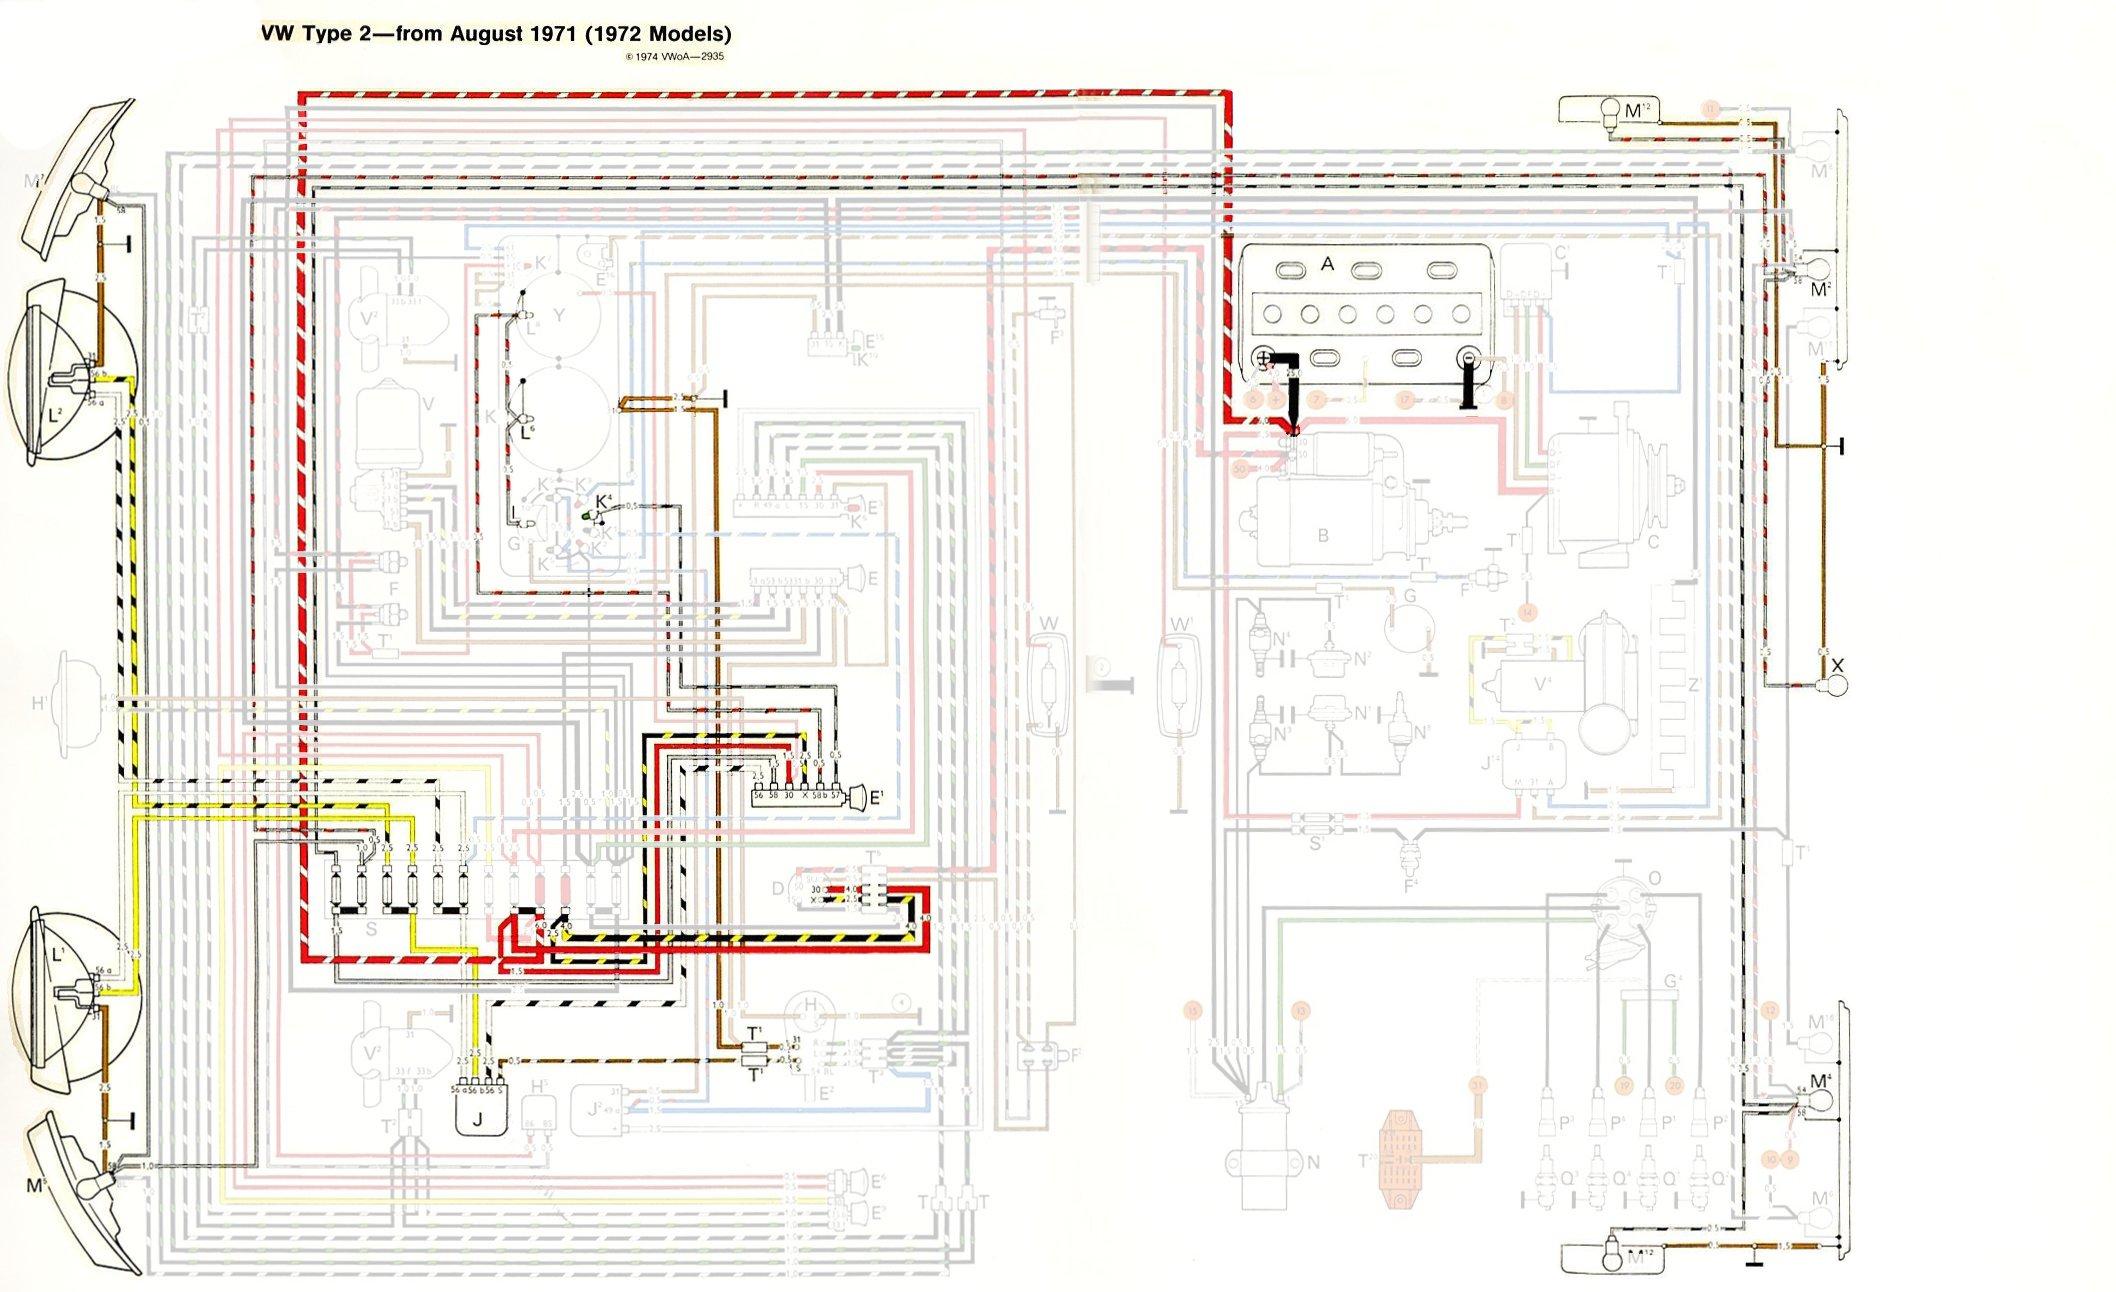 1977 vw bus wiring diagram vw bus wiring diagram jet l